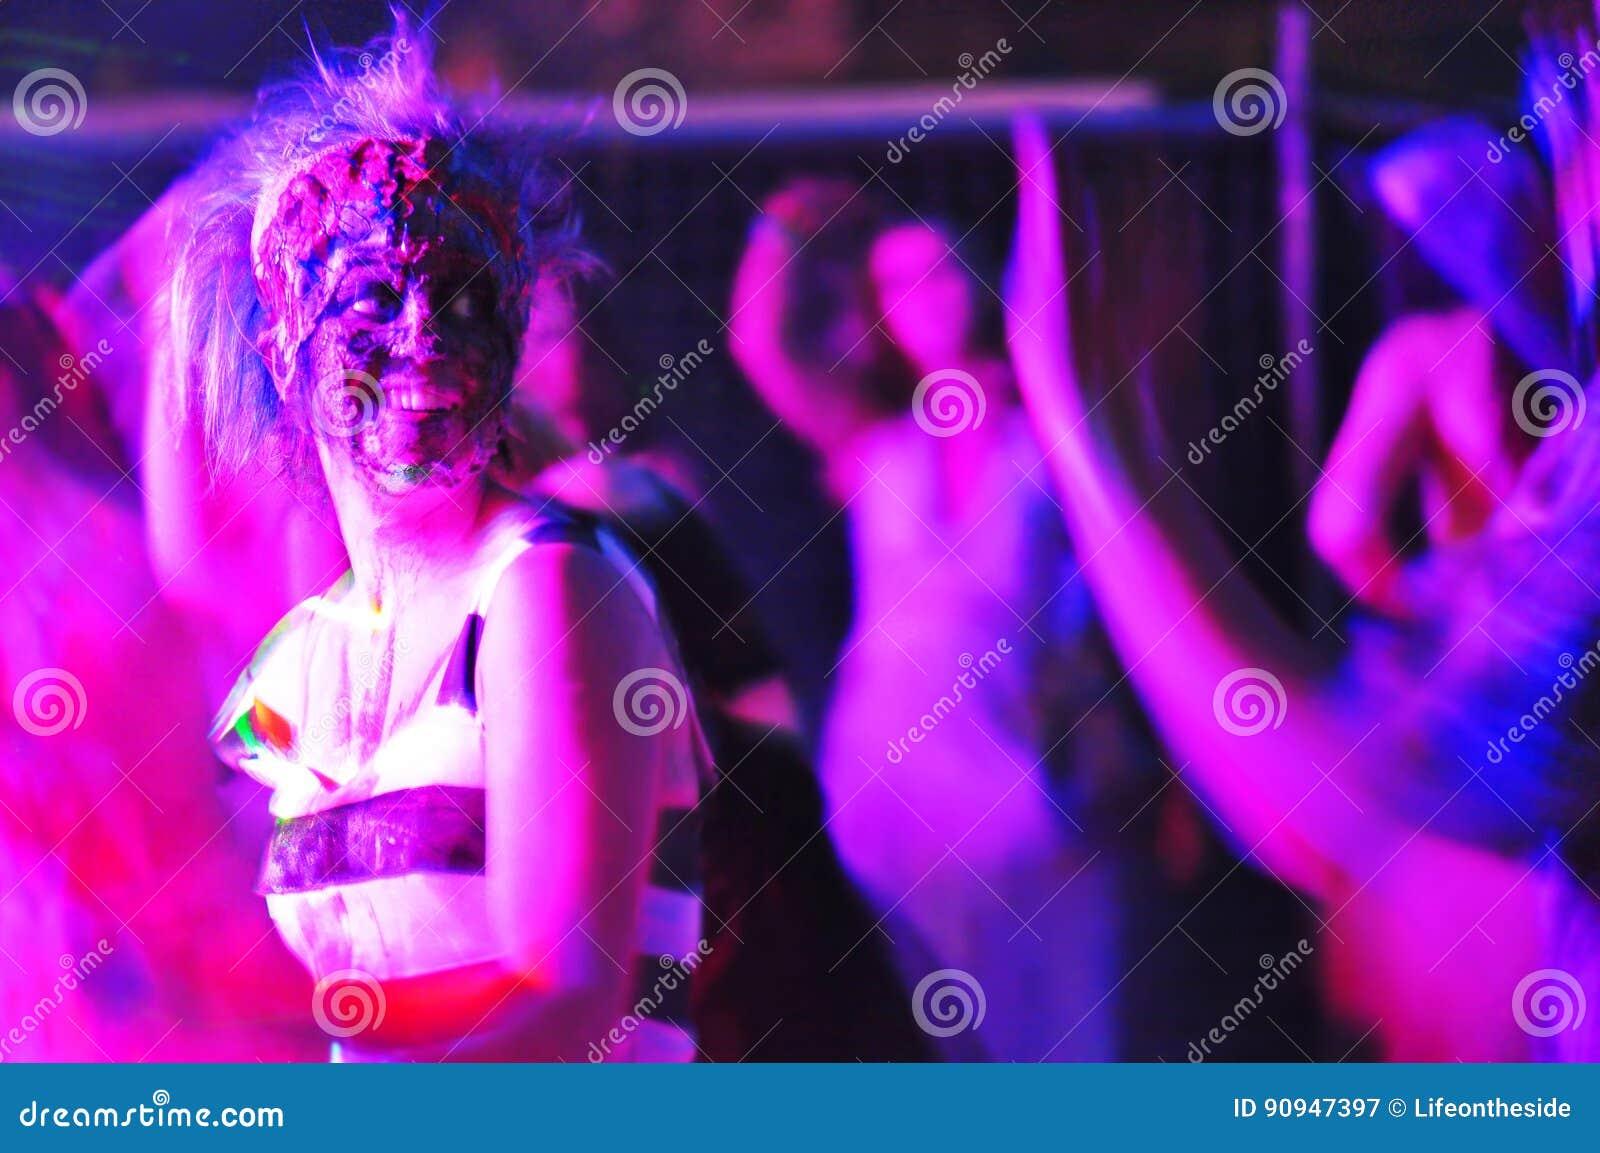 Abstract purple people dancing nightclub